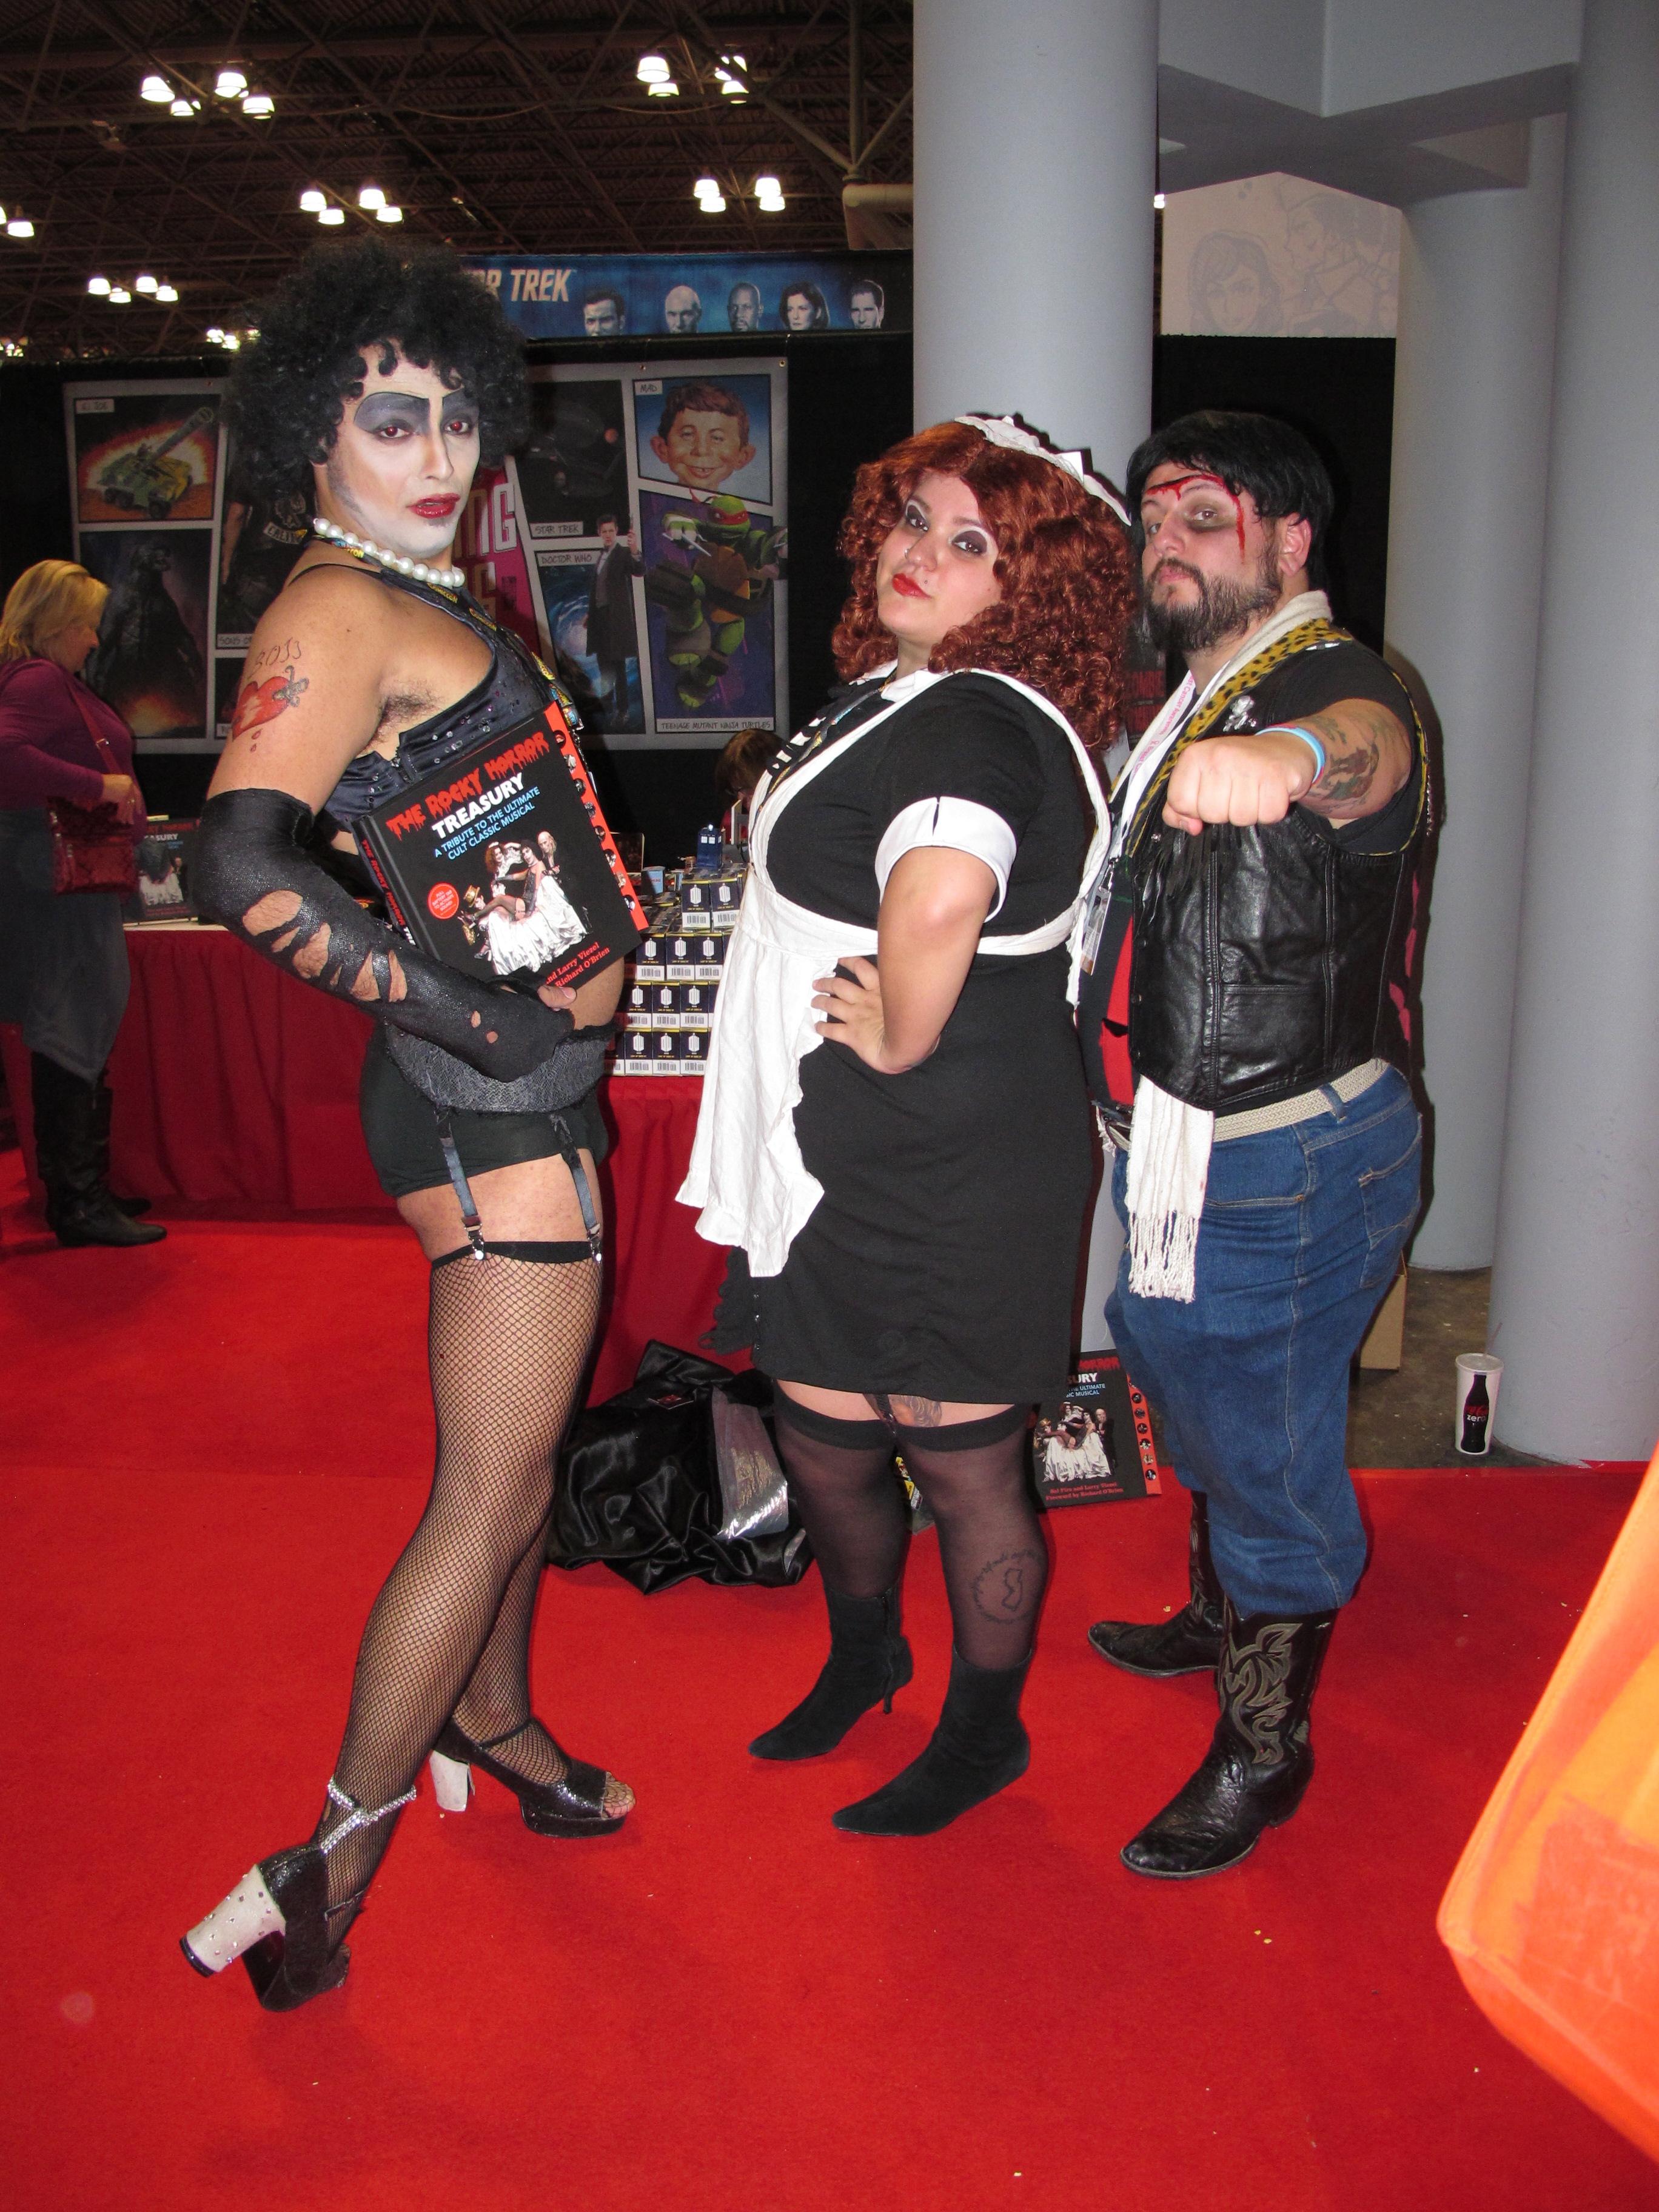 Spandex femdom mixed wrestling